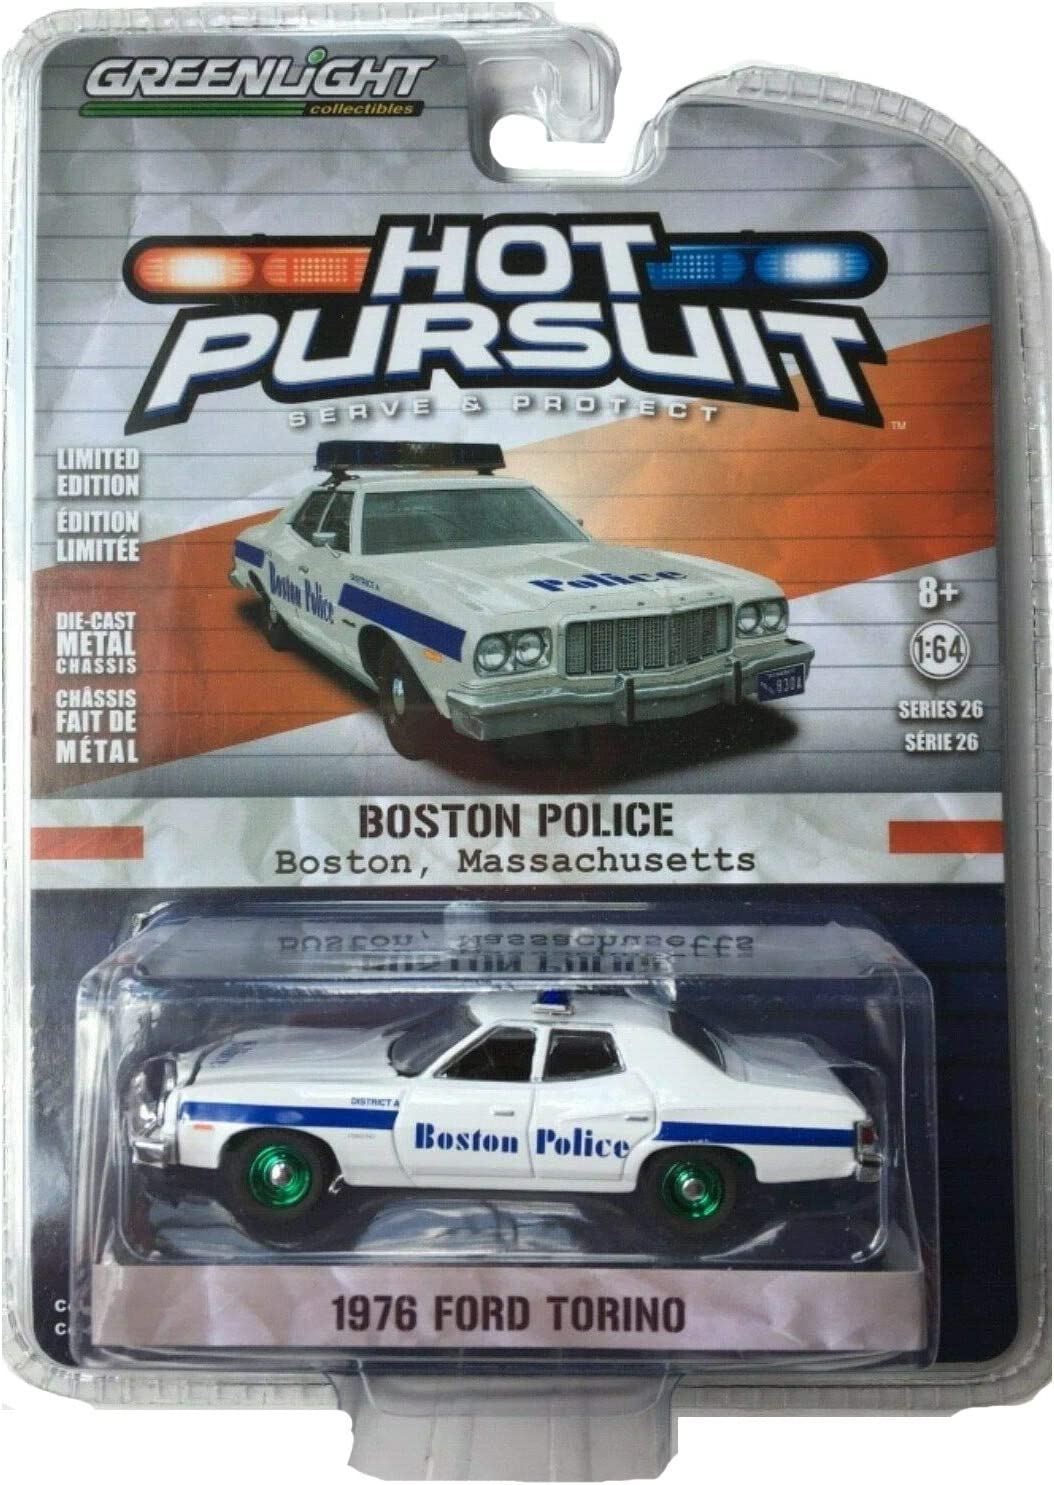 Greenlight  Hot Pursuit 1976 Ford Torino Boston Massachusetts Police